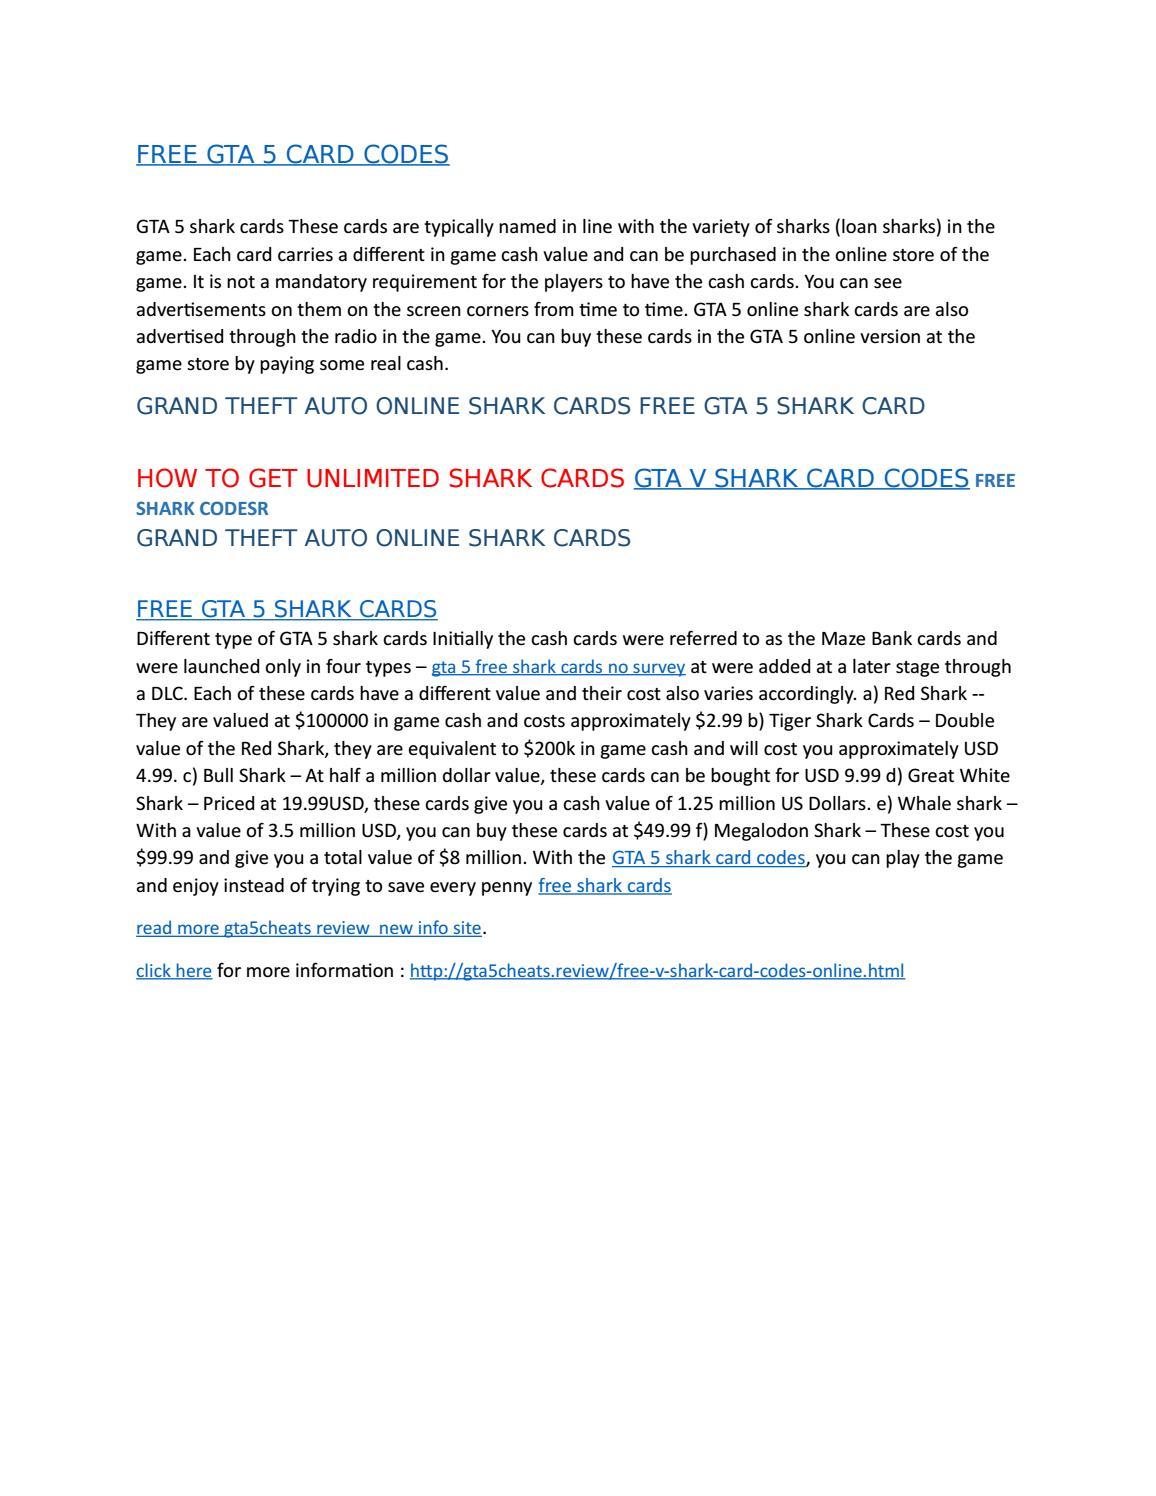 free shark cards gta 5 codes